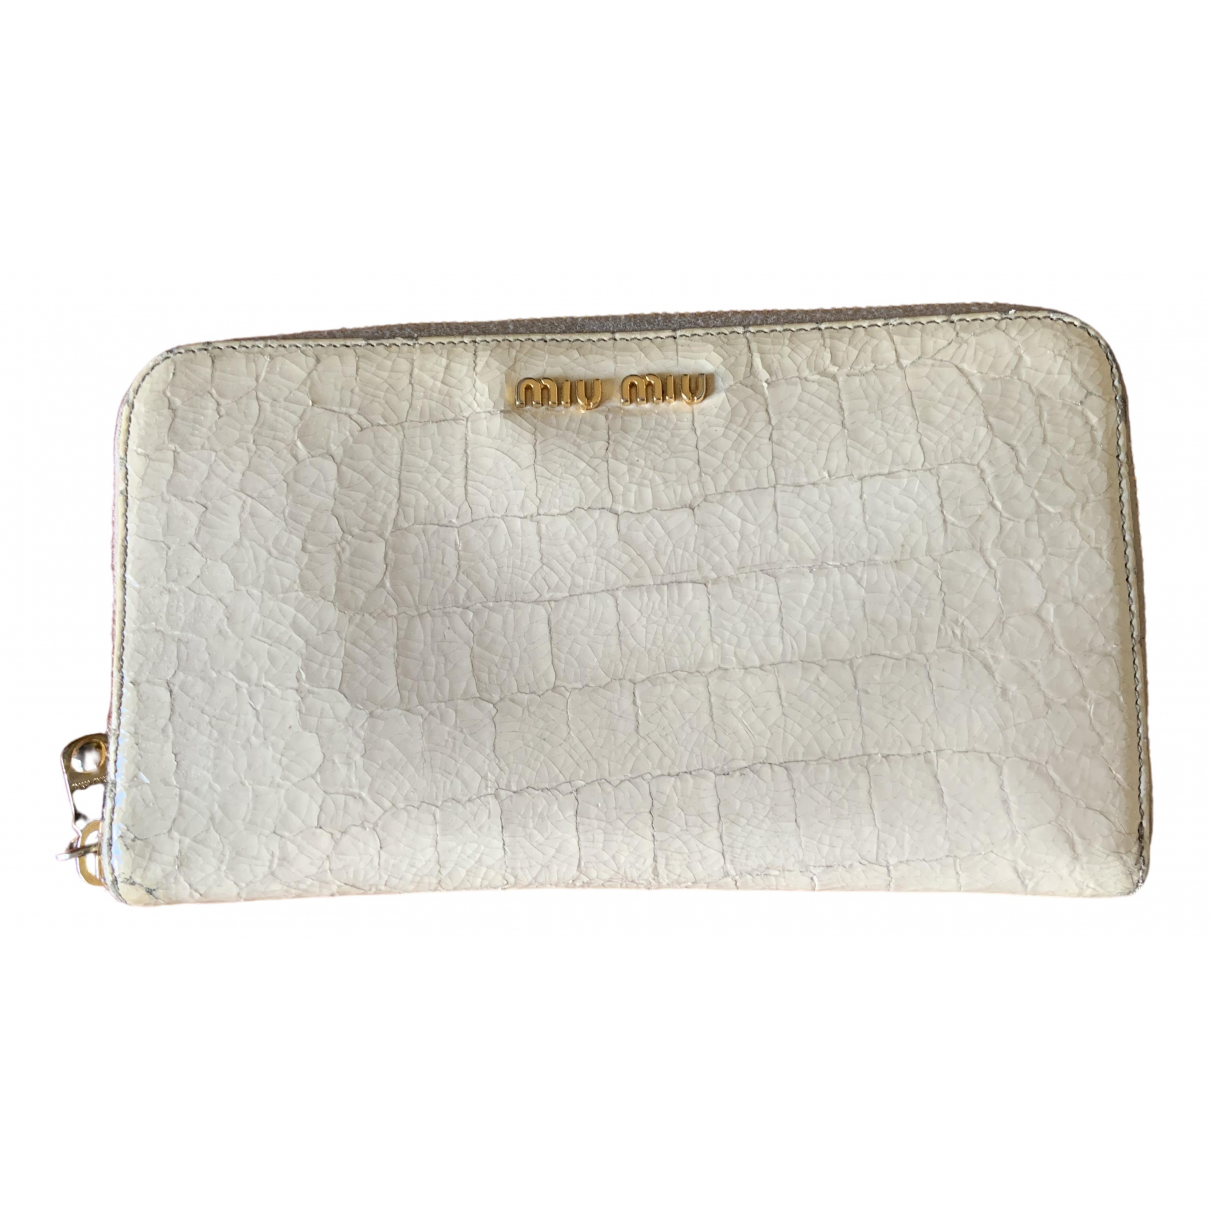 Miu Miu \N White Leather wallet for Women \N